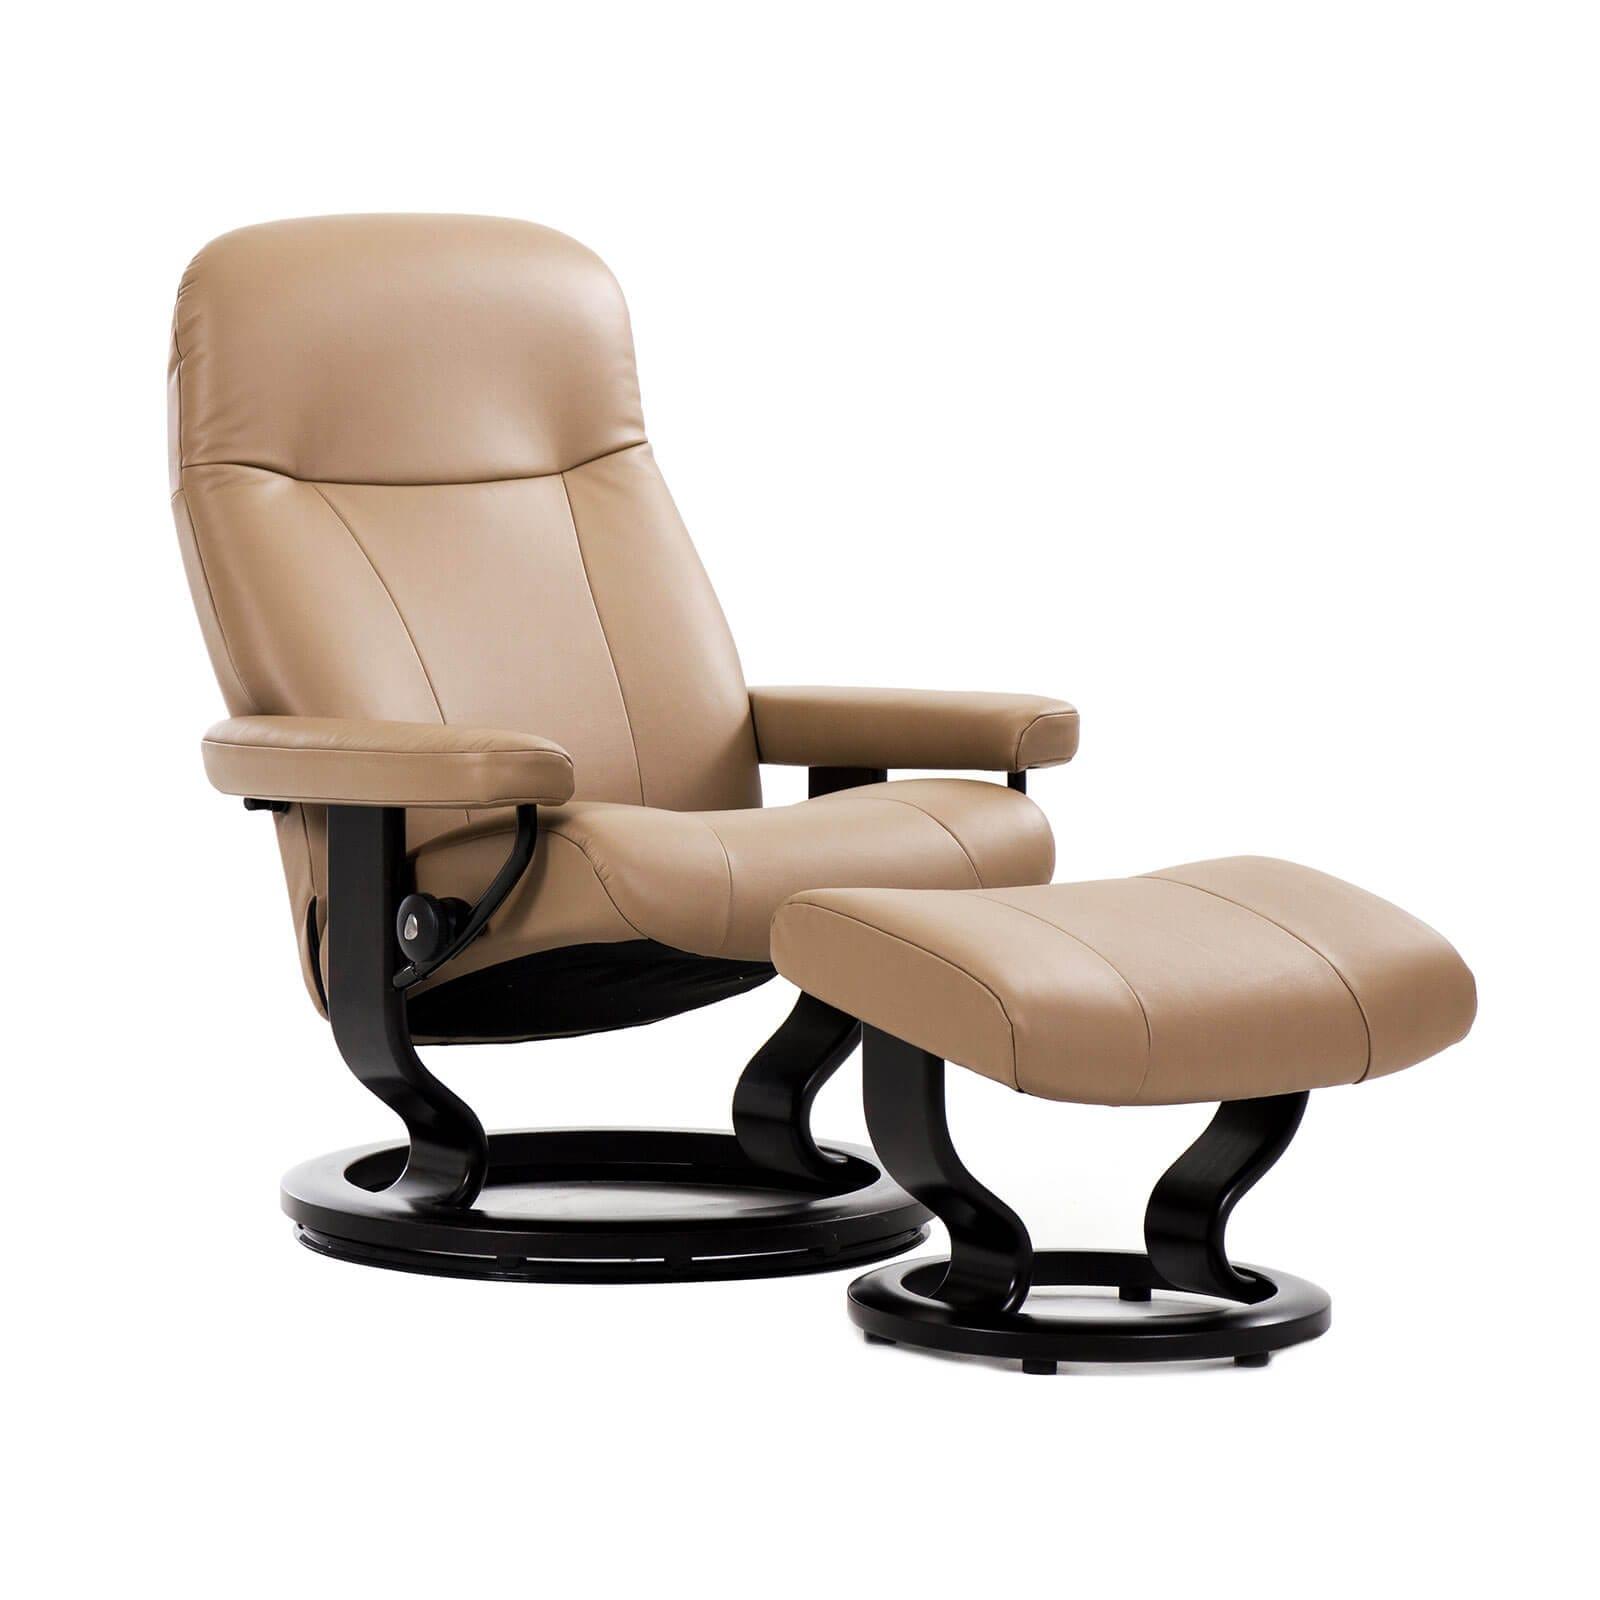 stressless sessel garda paloma sand classic schwarz hocker. Black Bedroom Furniture Sets. Home Design Ideas